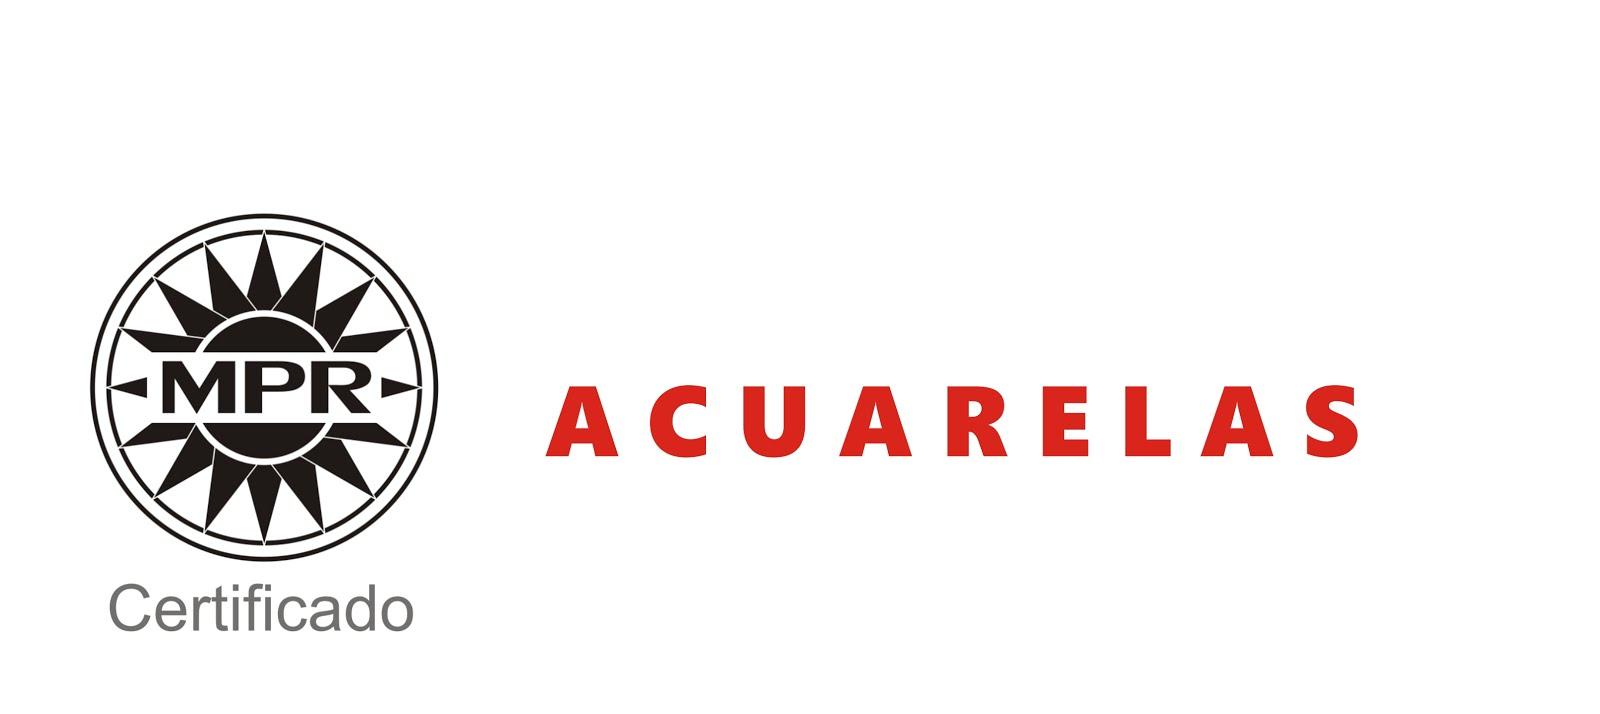 Asociación - Acoarela / Acuarelas